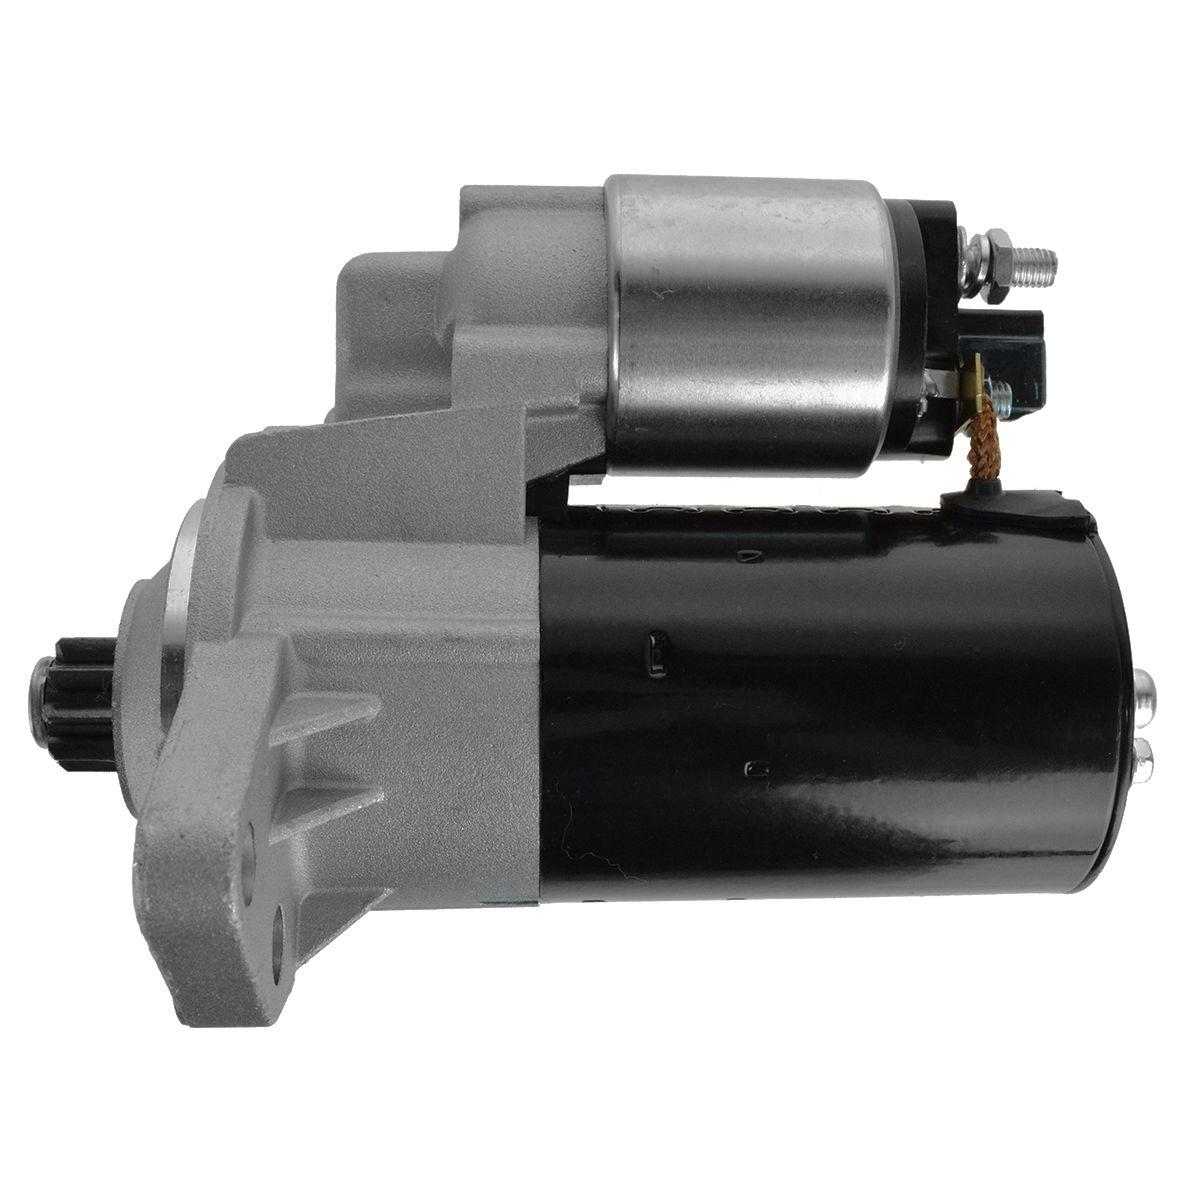 Starter Motor For Vw Volkswagen Beetle Cabrio Golf Jetta Passat 1 8l 2 0l